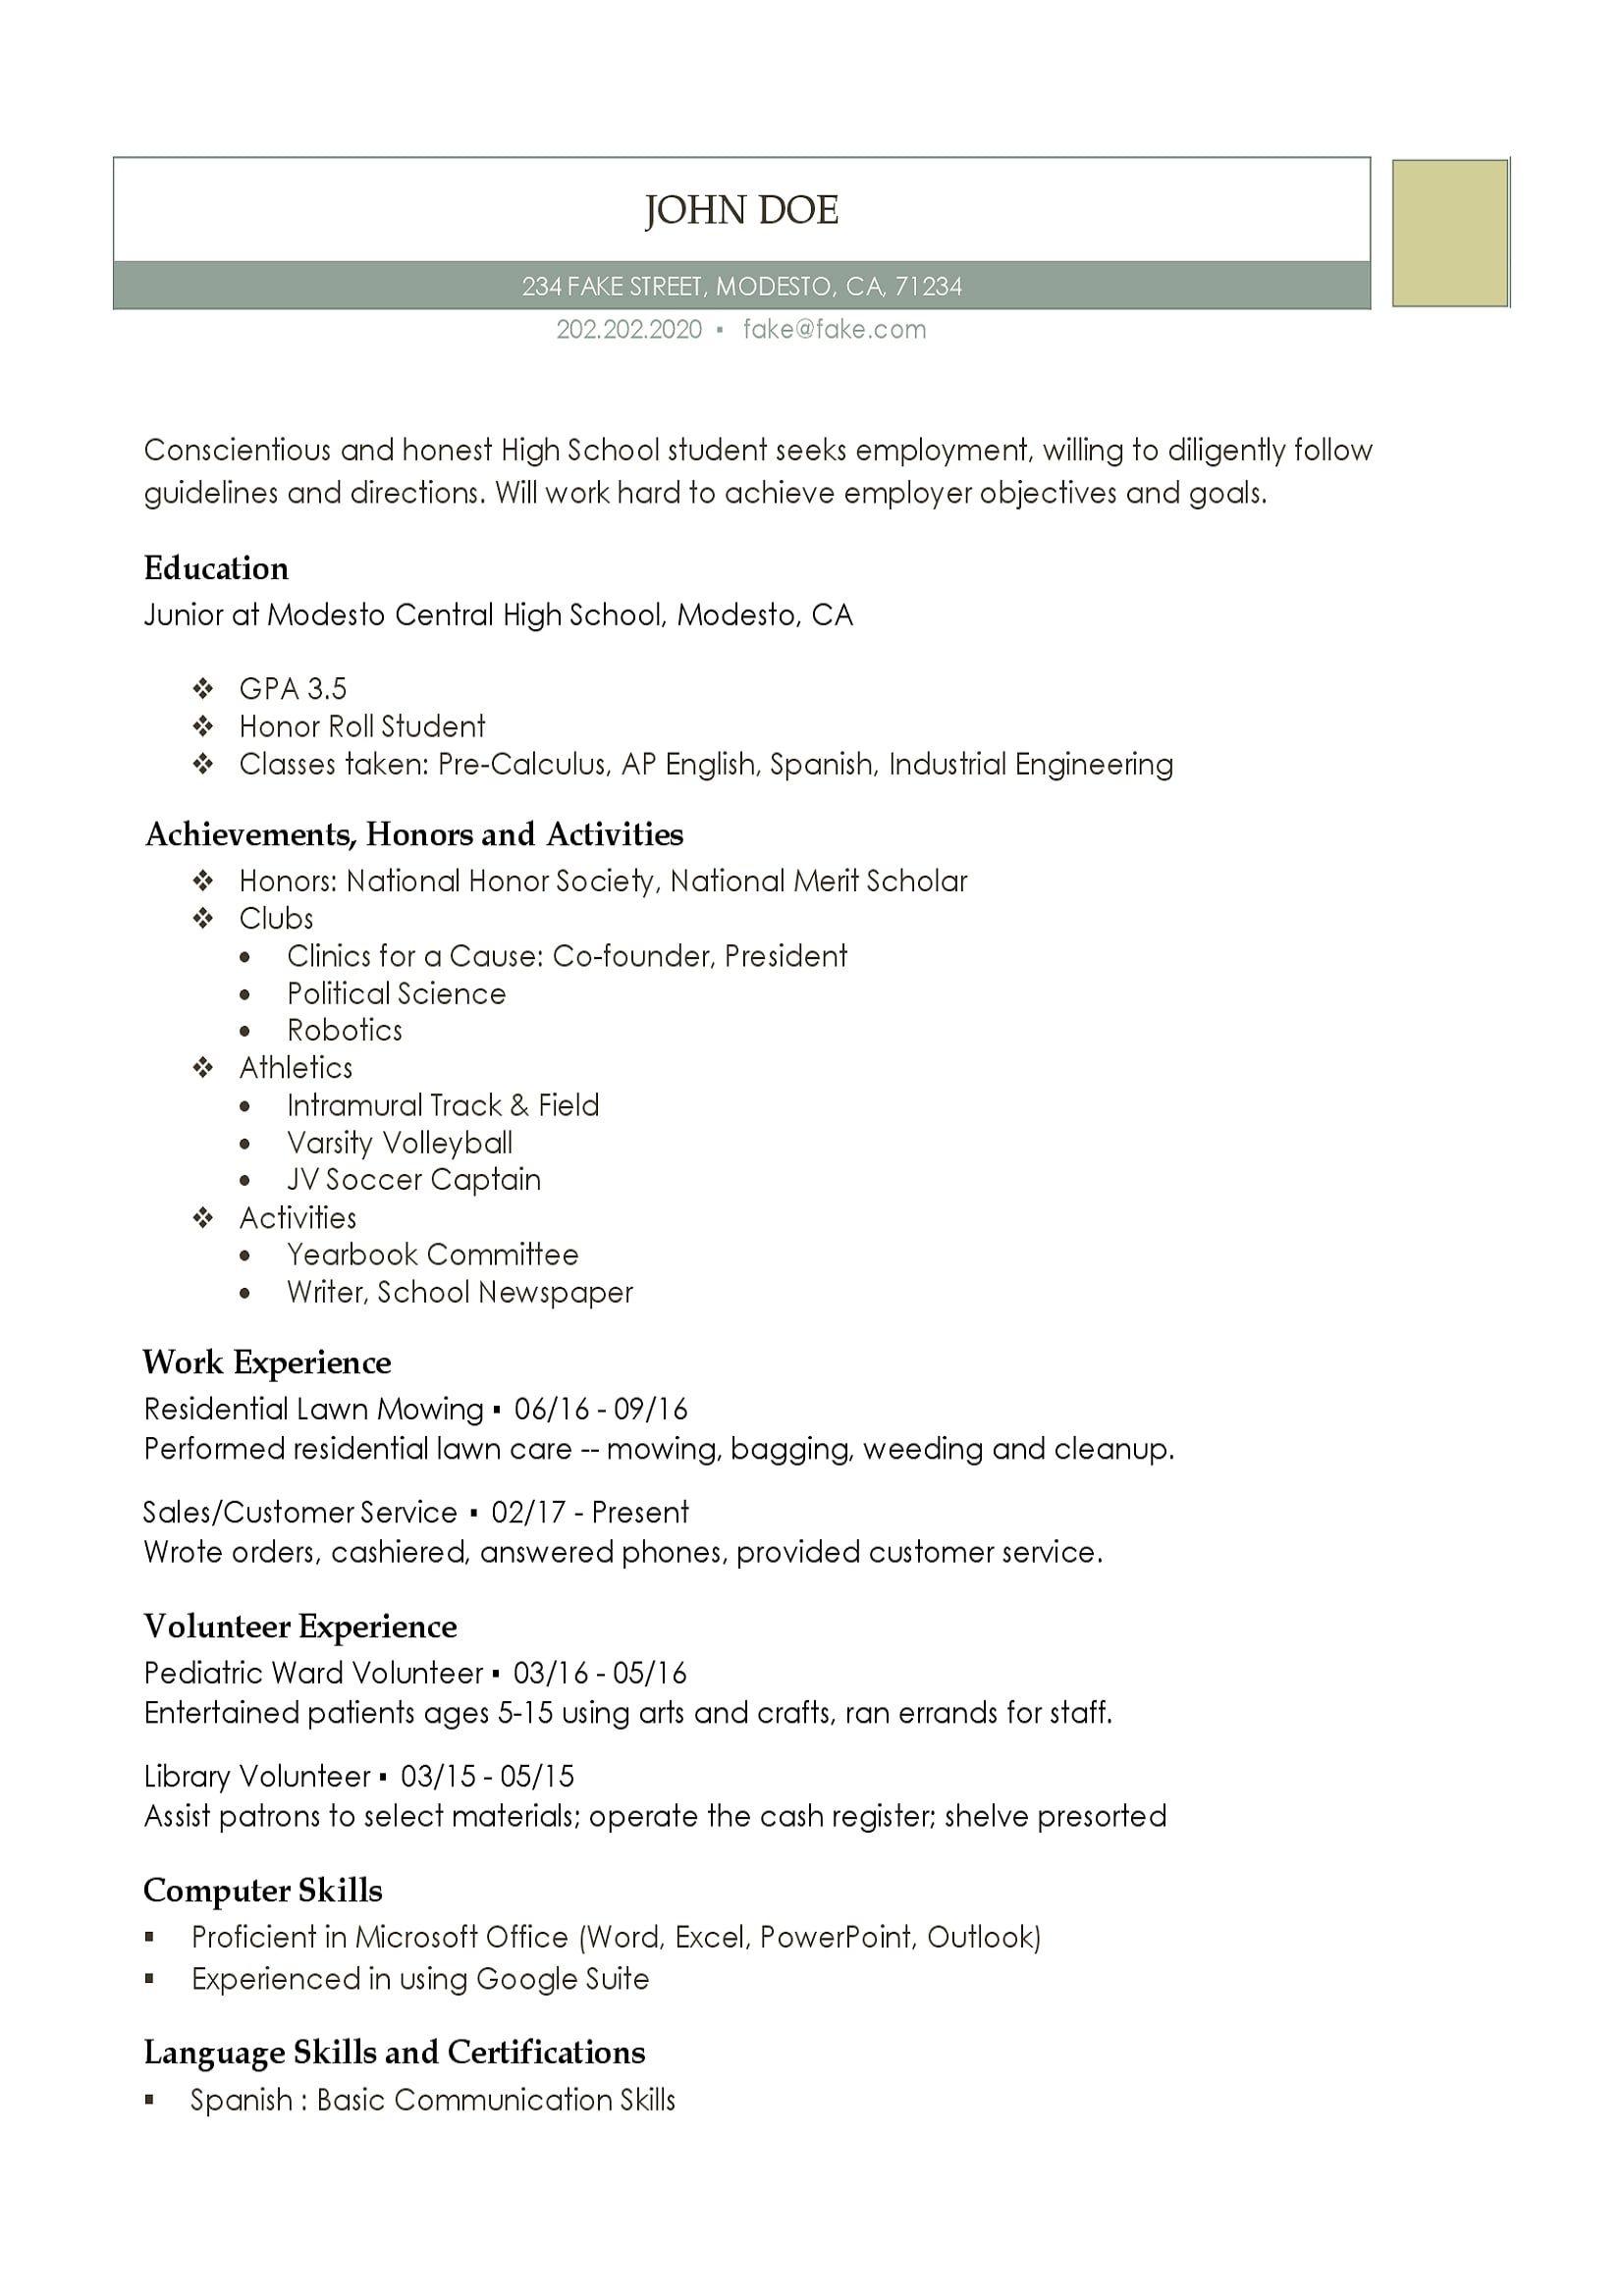 003 Unusual Free High School Graduate Resume Template Definition  TemplatesFull